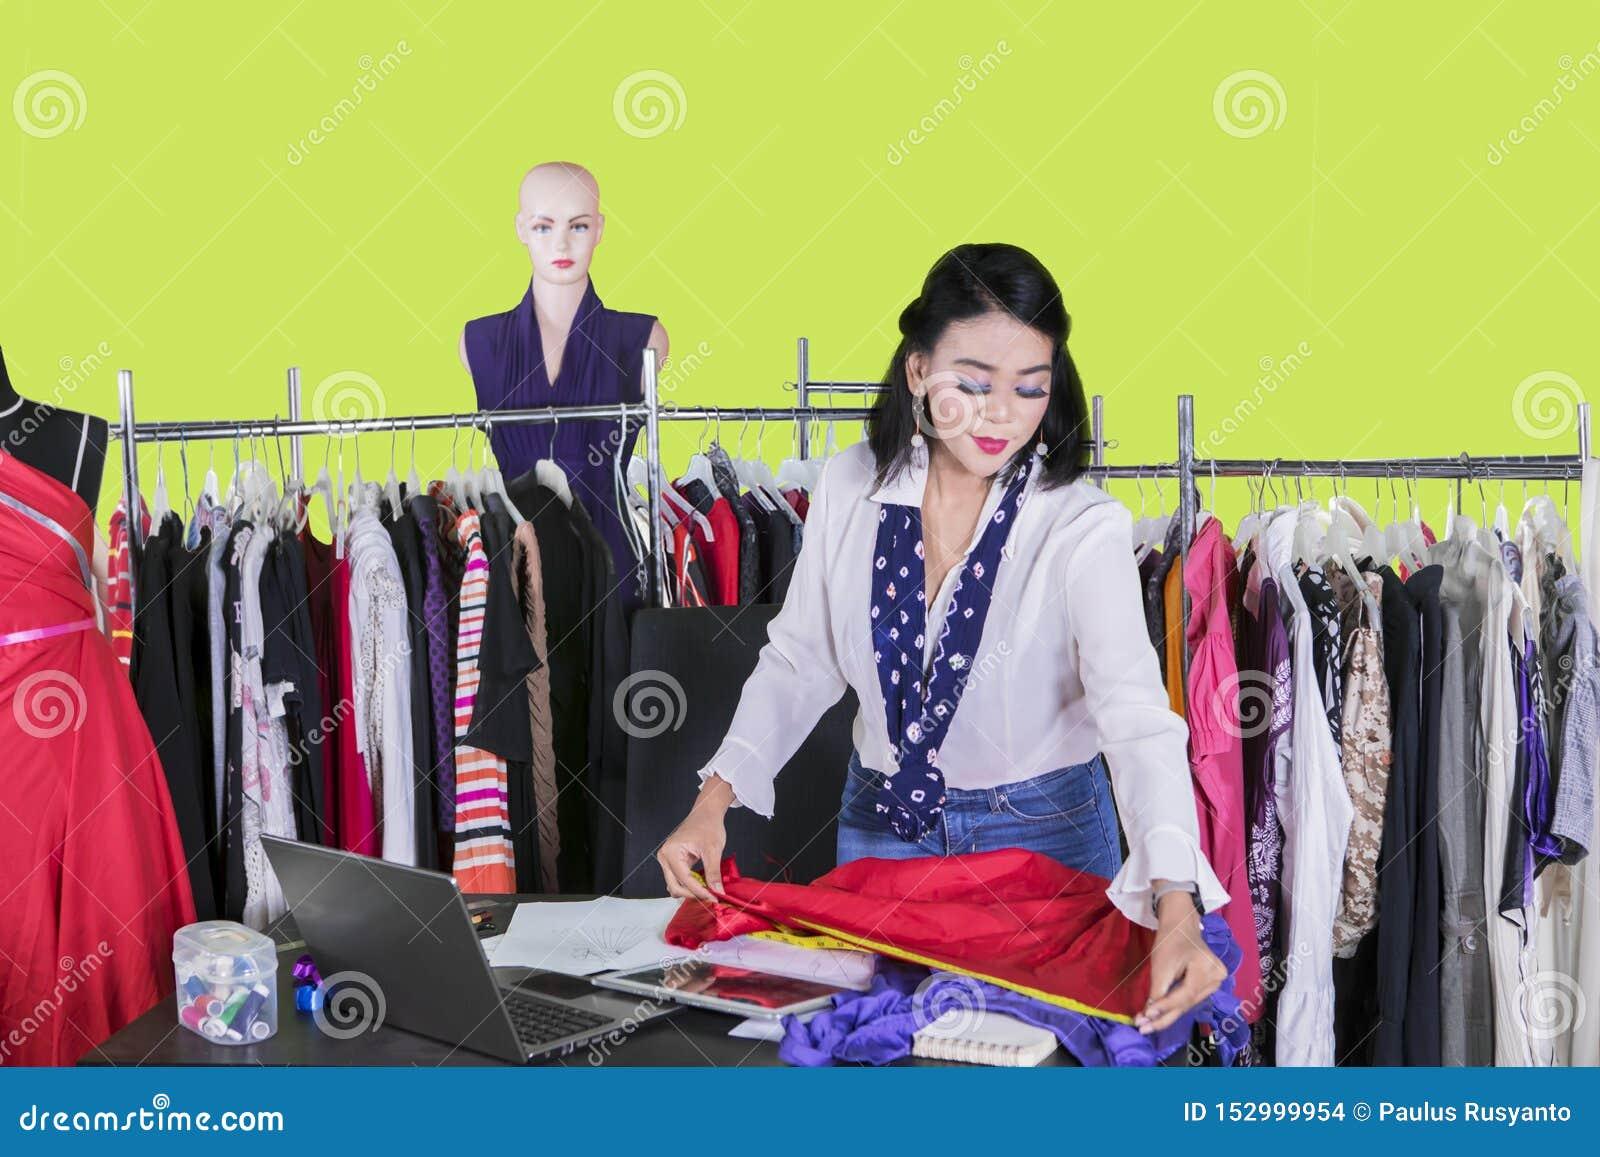 Asian female dressmaker measuring a fabric